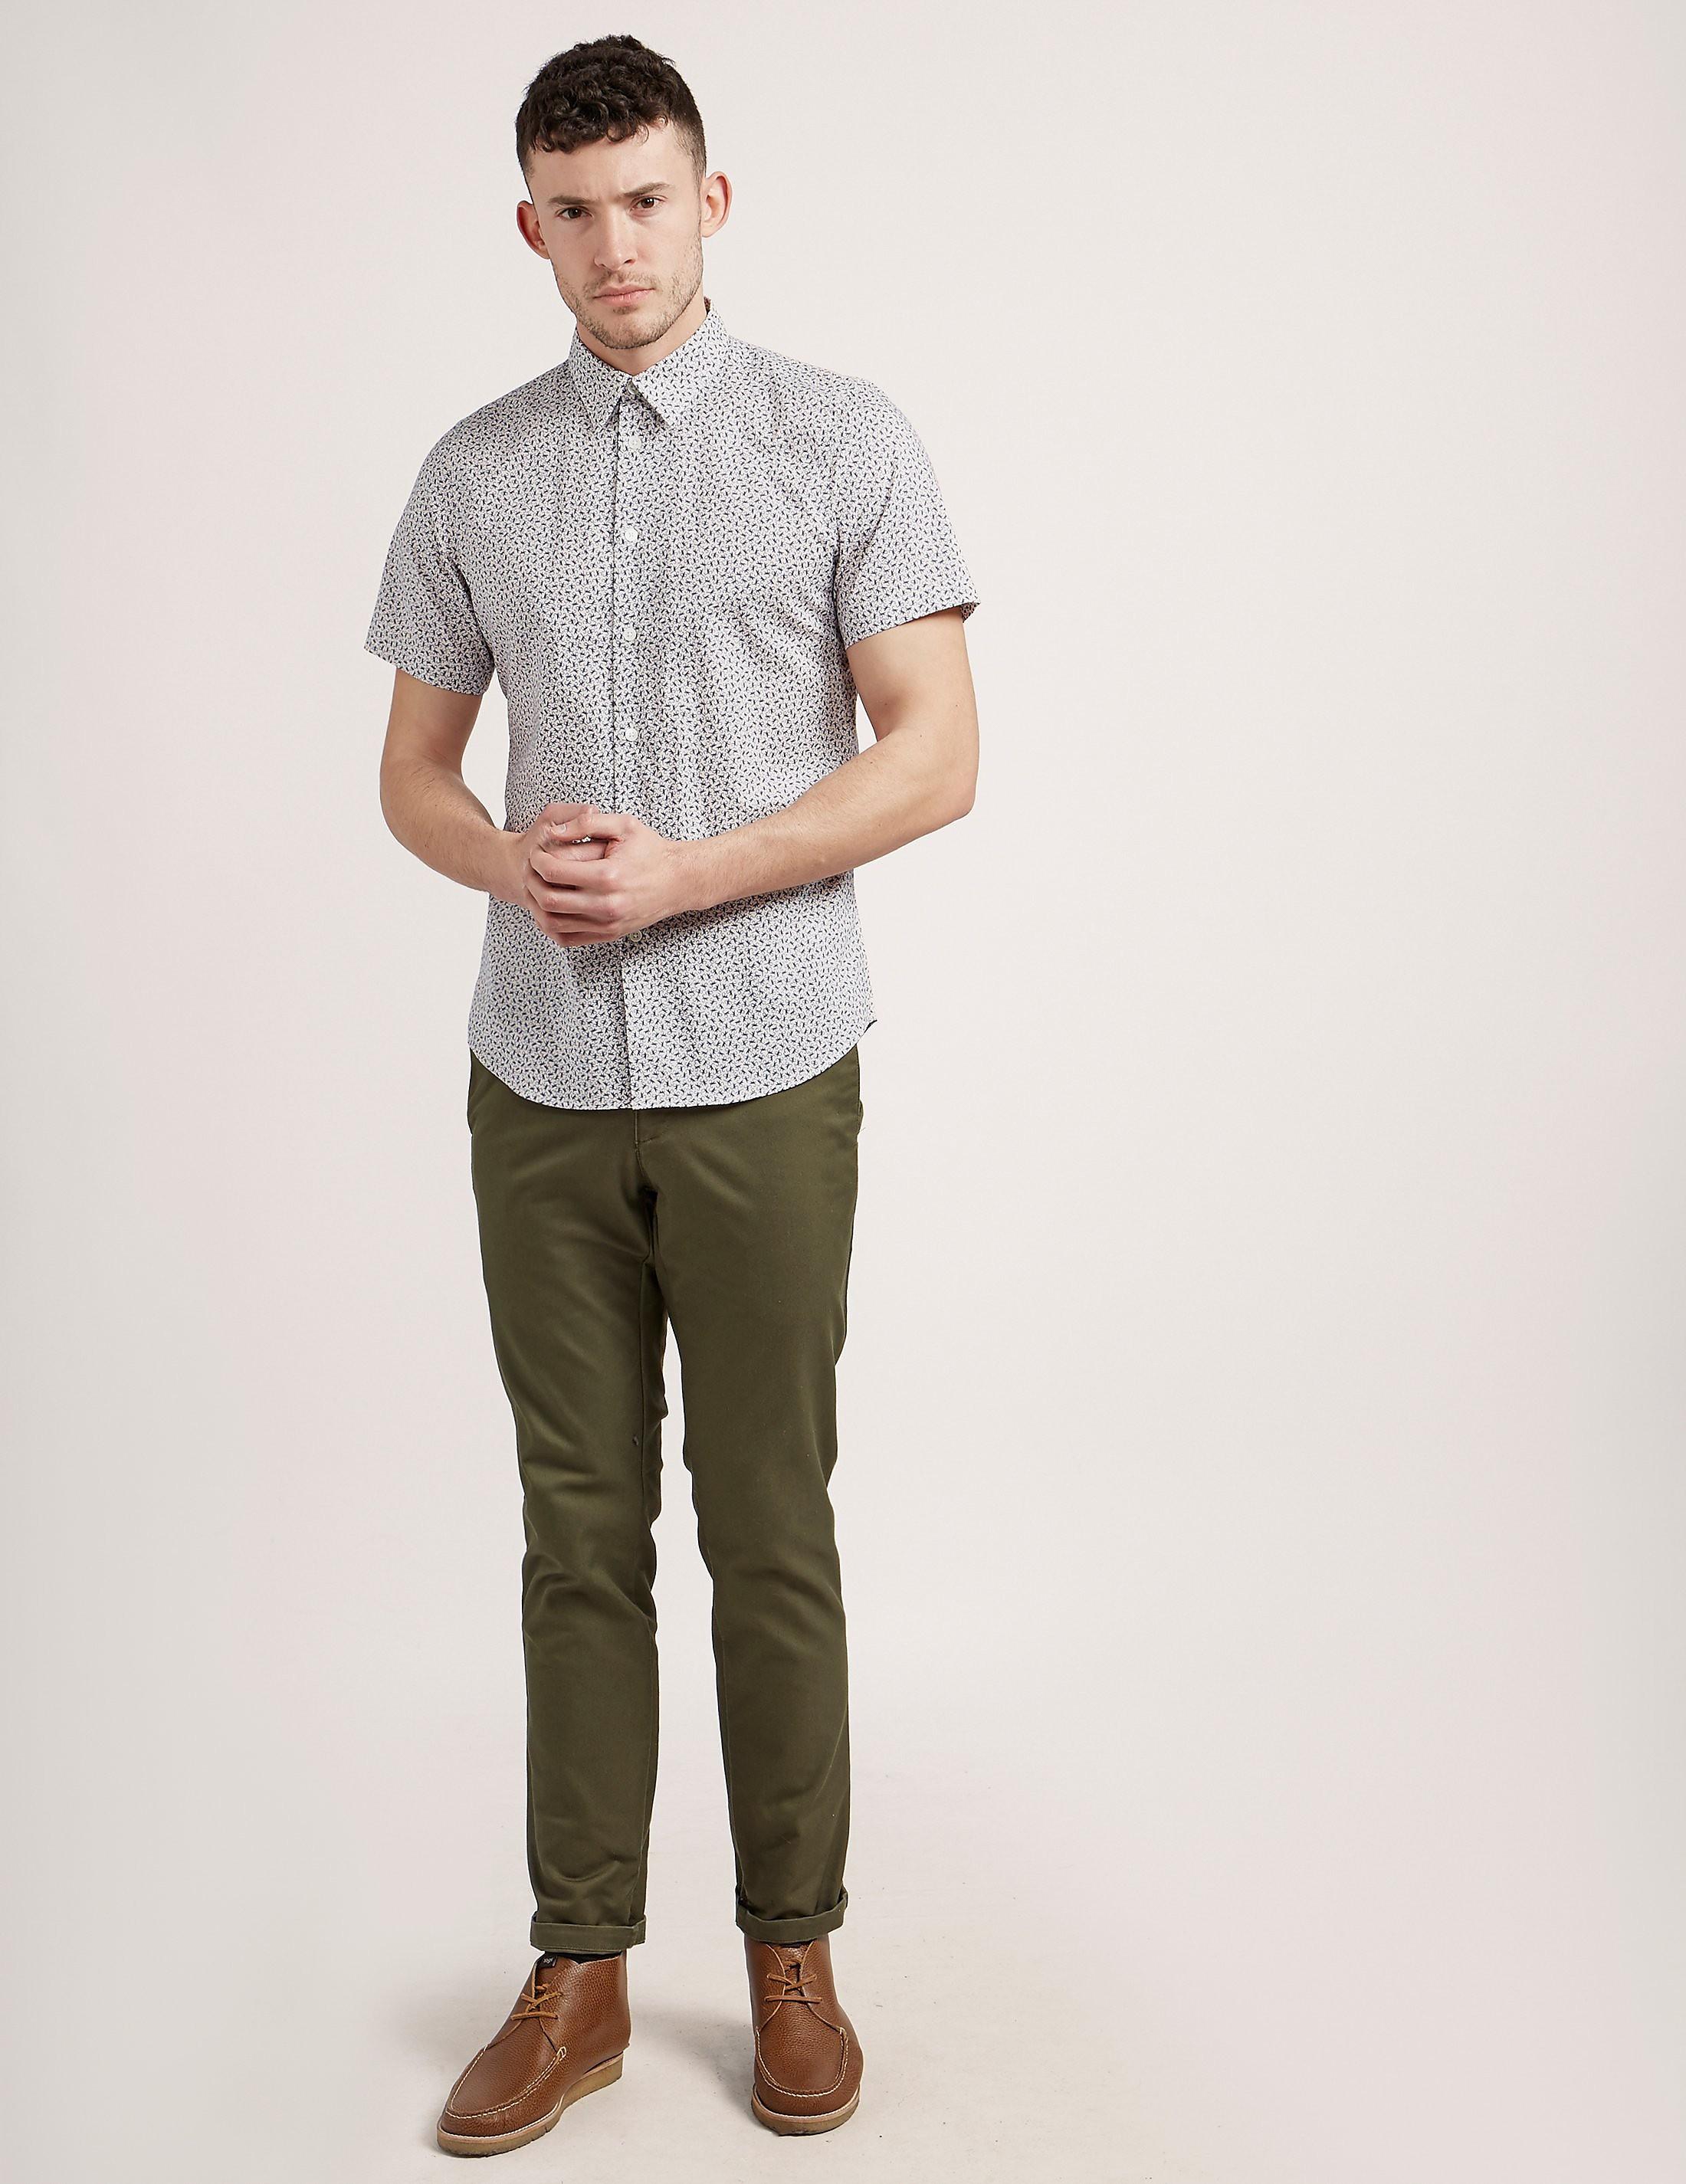 Paul Smith Monkey Print Short Sleeve T-Shirt